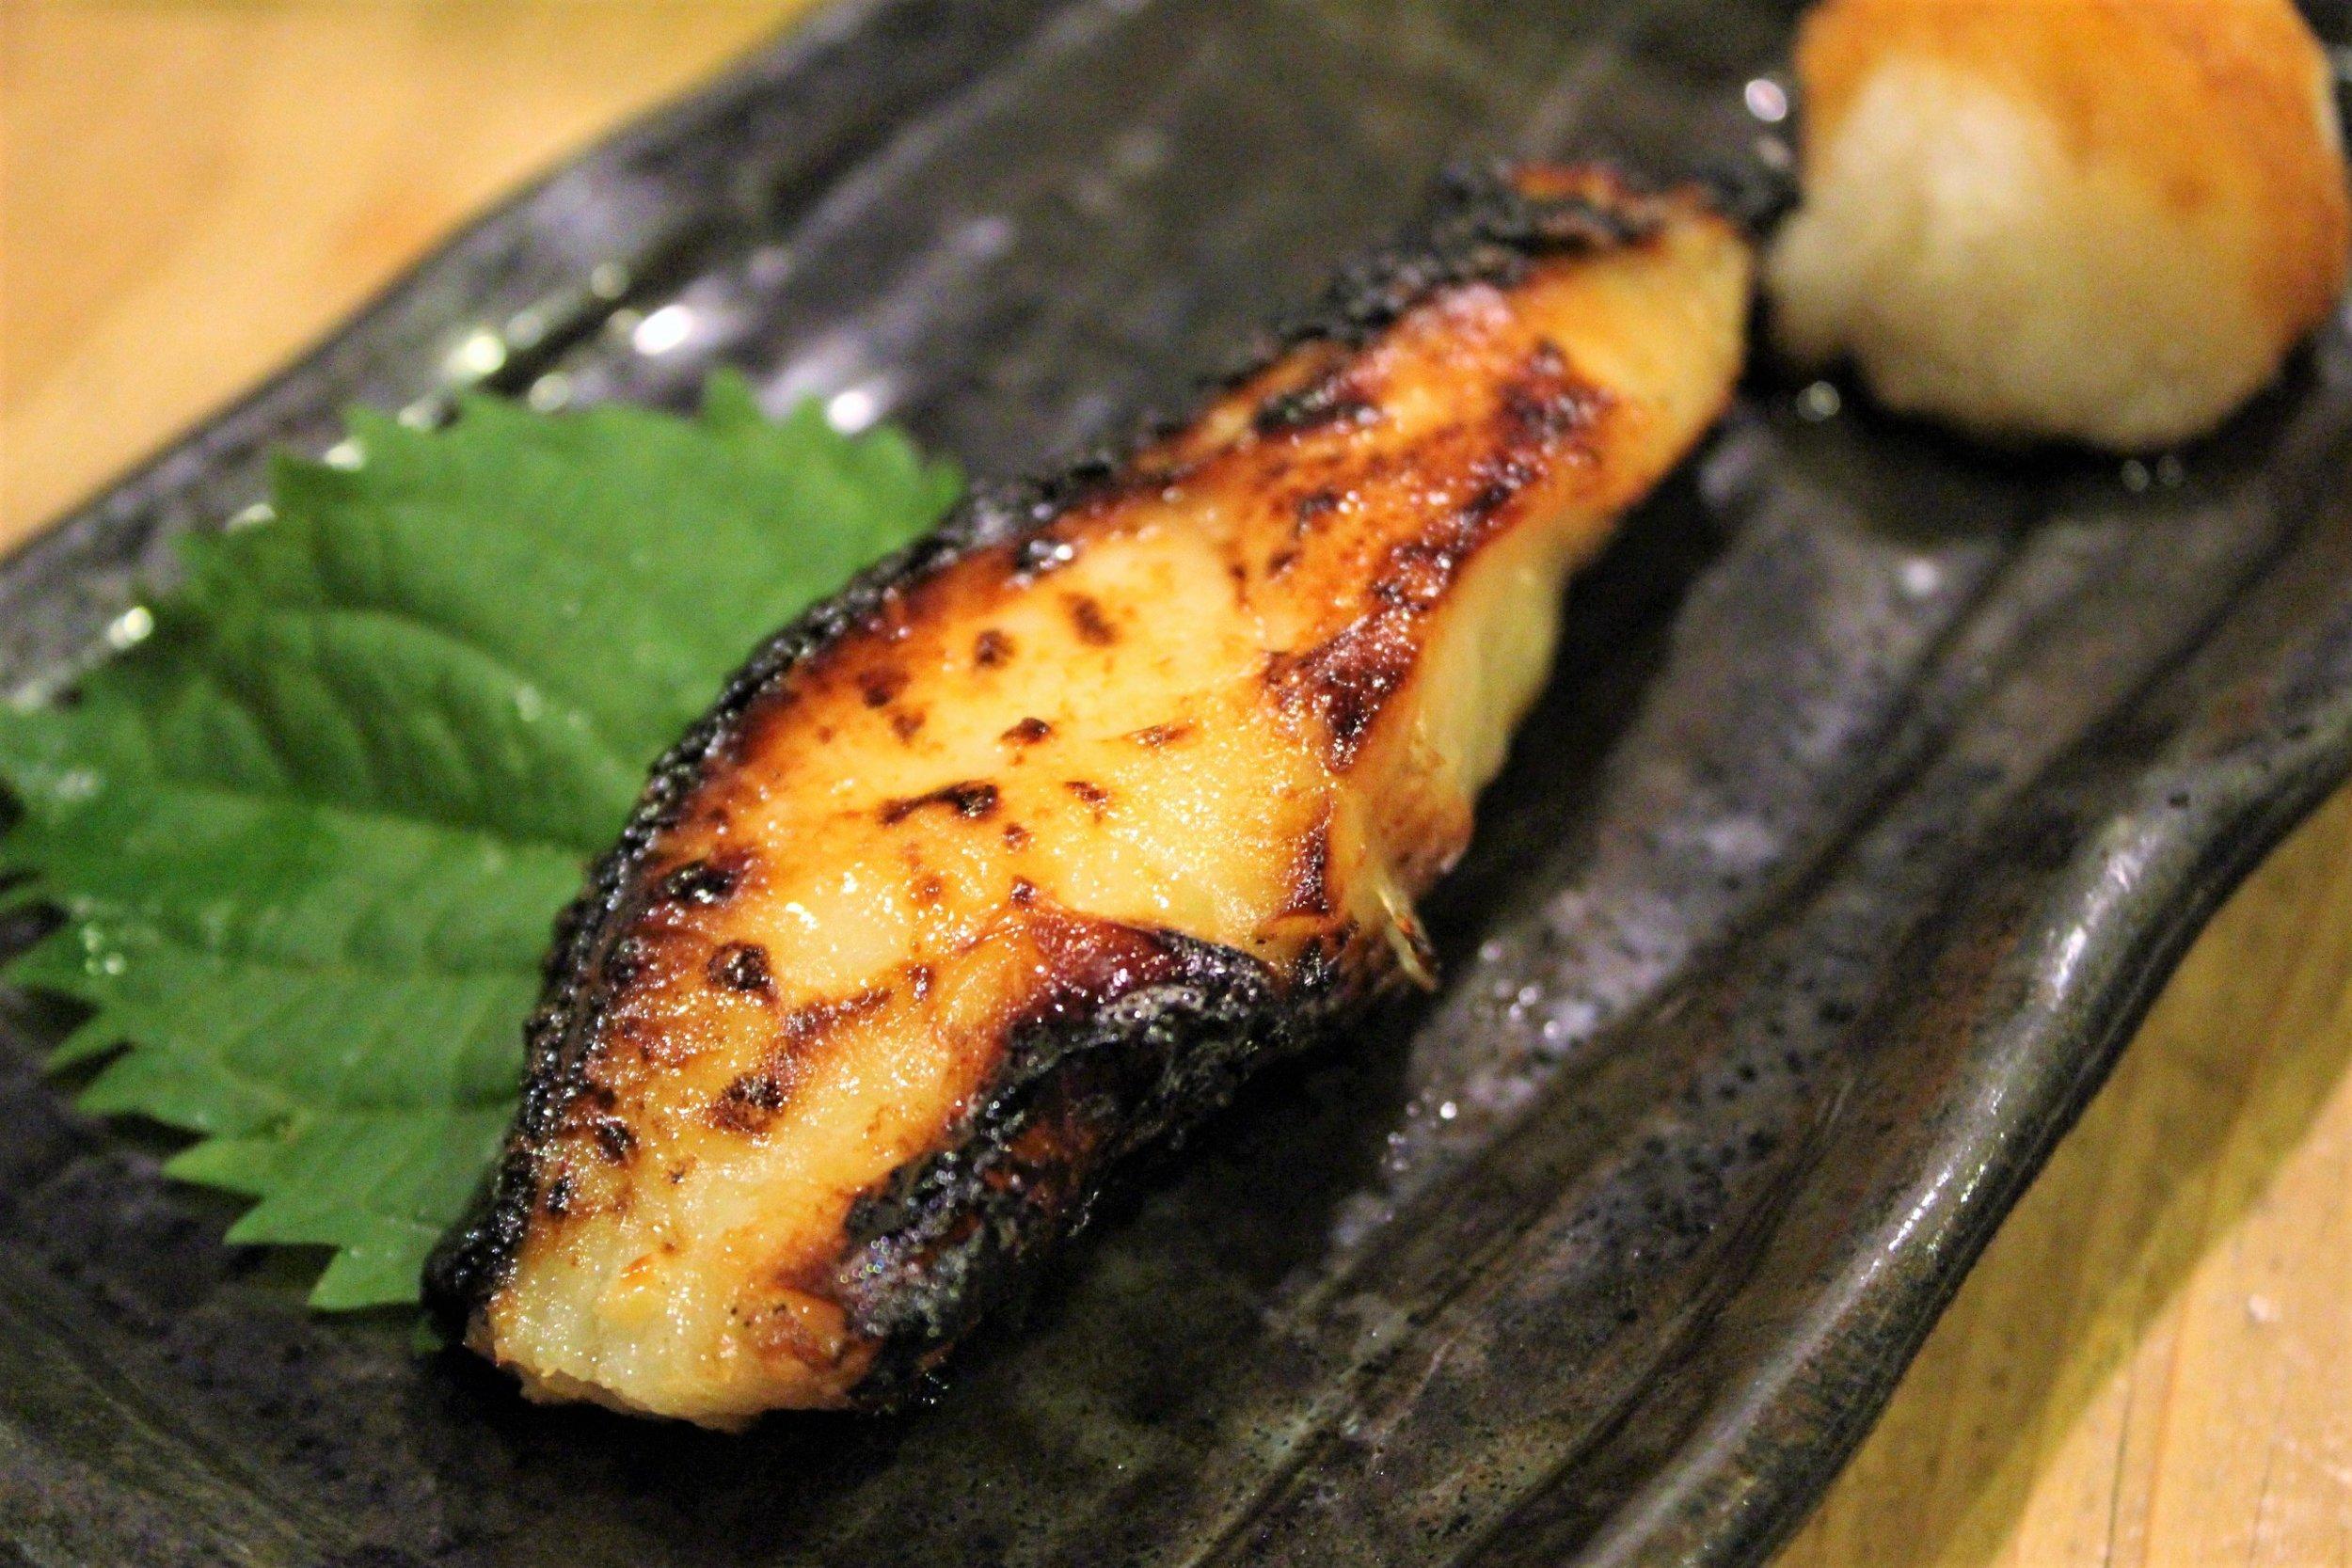 Grilled Black Cod with Saikyo Miso at Ganchan in Tokyo